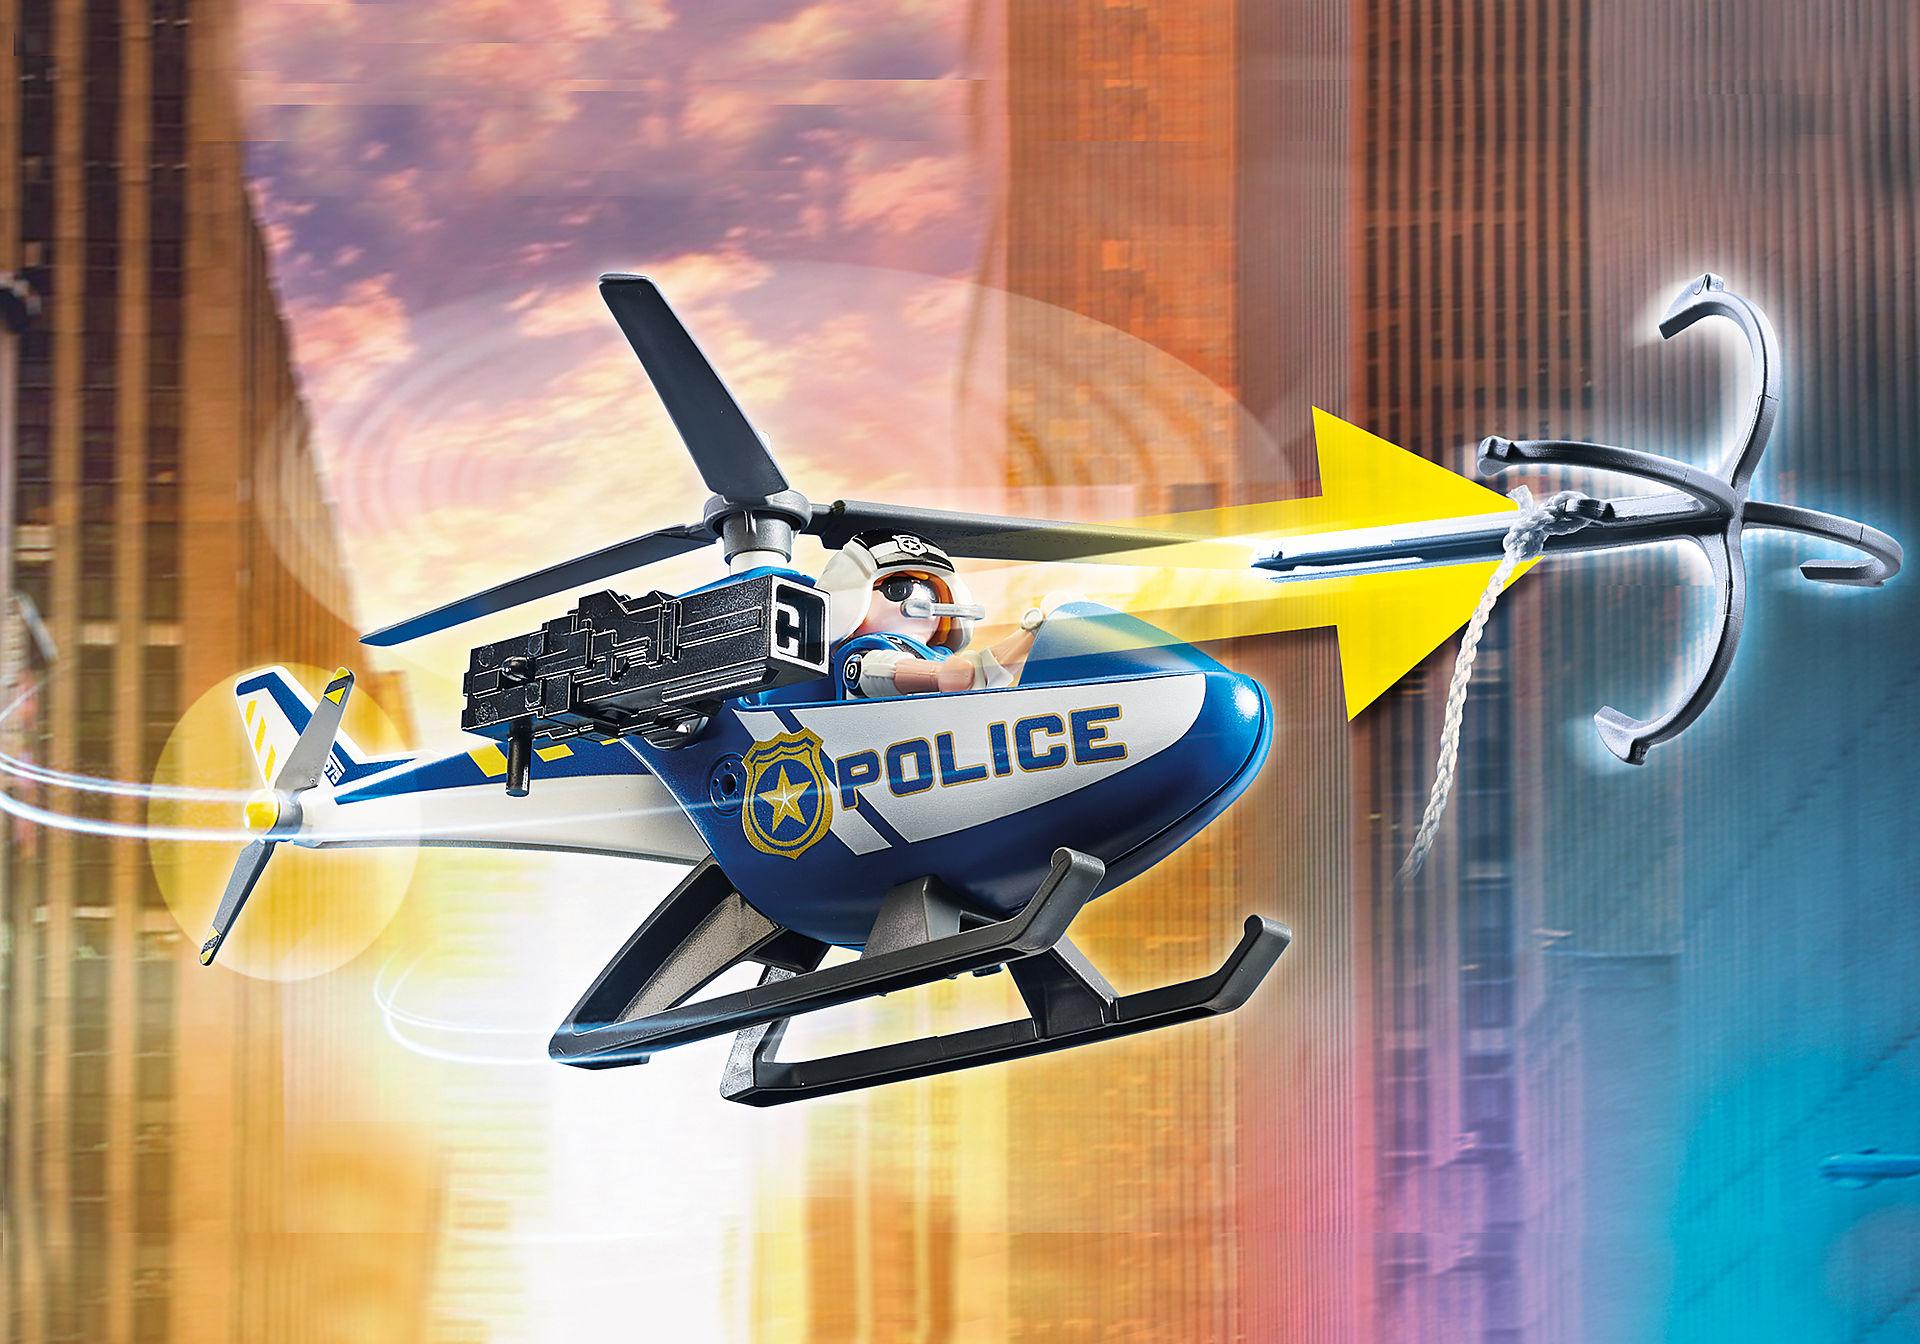 70575 Poliisihelikopteri: Pakoajoneuvon takaa-ajo zoom image6